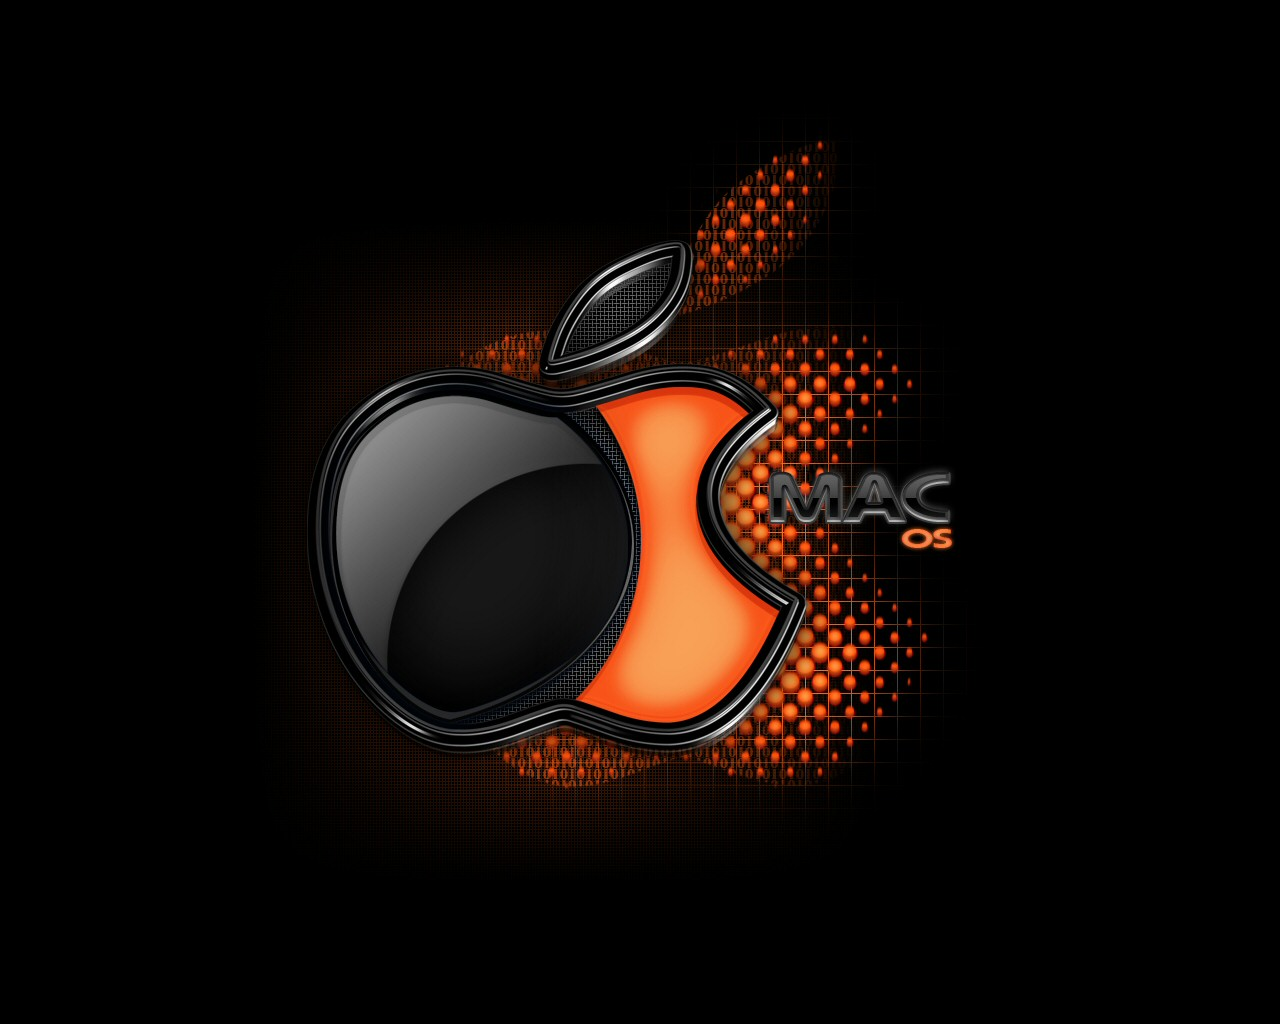 http://1.bp.blogspot.com/_6KG03E9p96U/S_02jA5FatI/AAAAAAAAABg/ZwVWO-OYfWM/s1600/Computer_Apple_Mac_OS_Orange.jpg